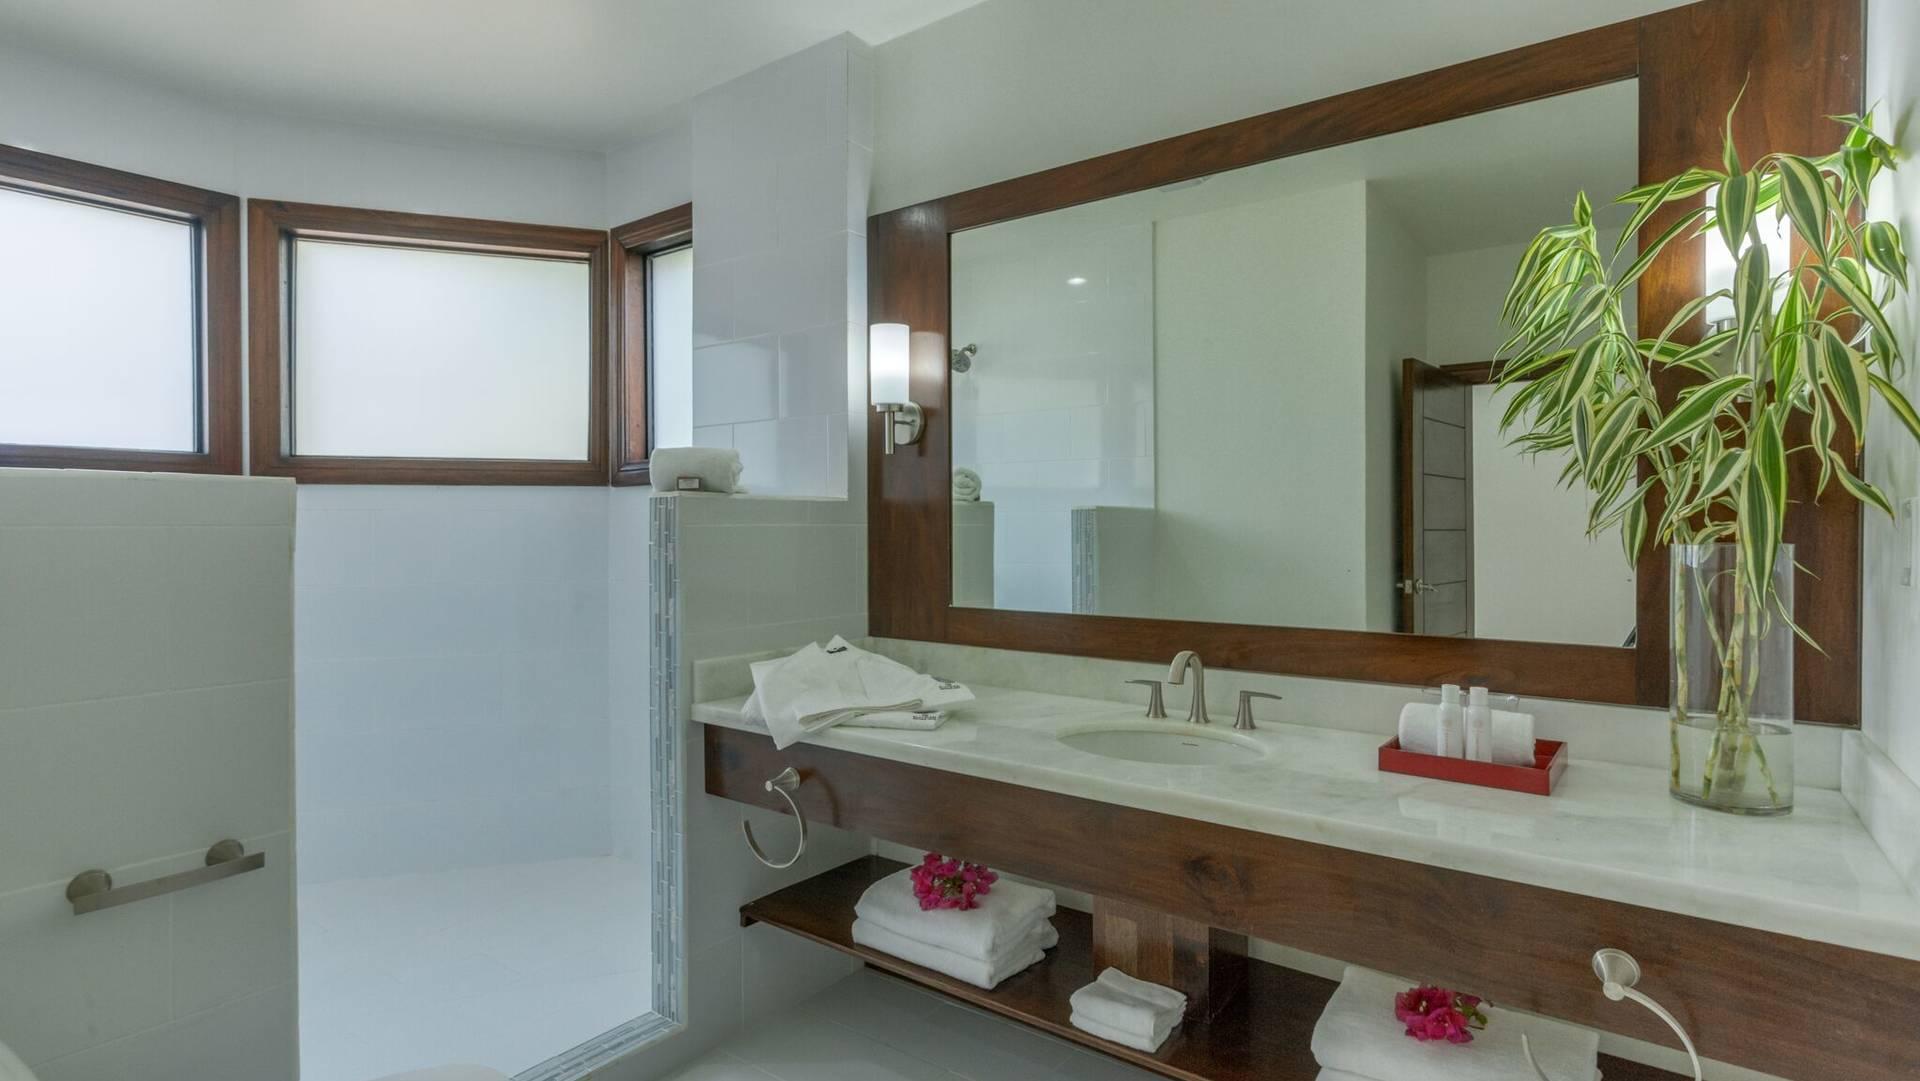 The-Ellysian-bathroom